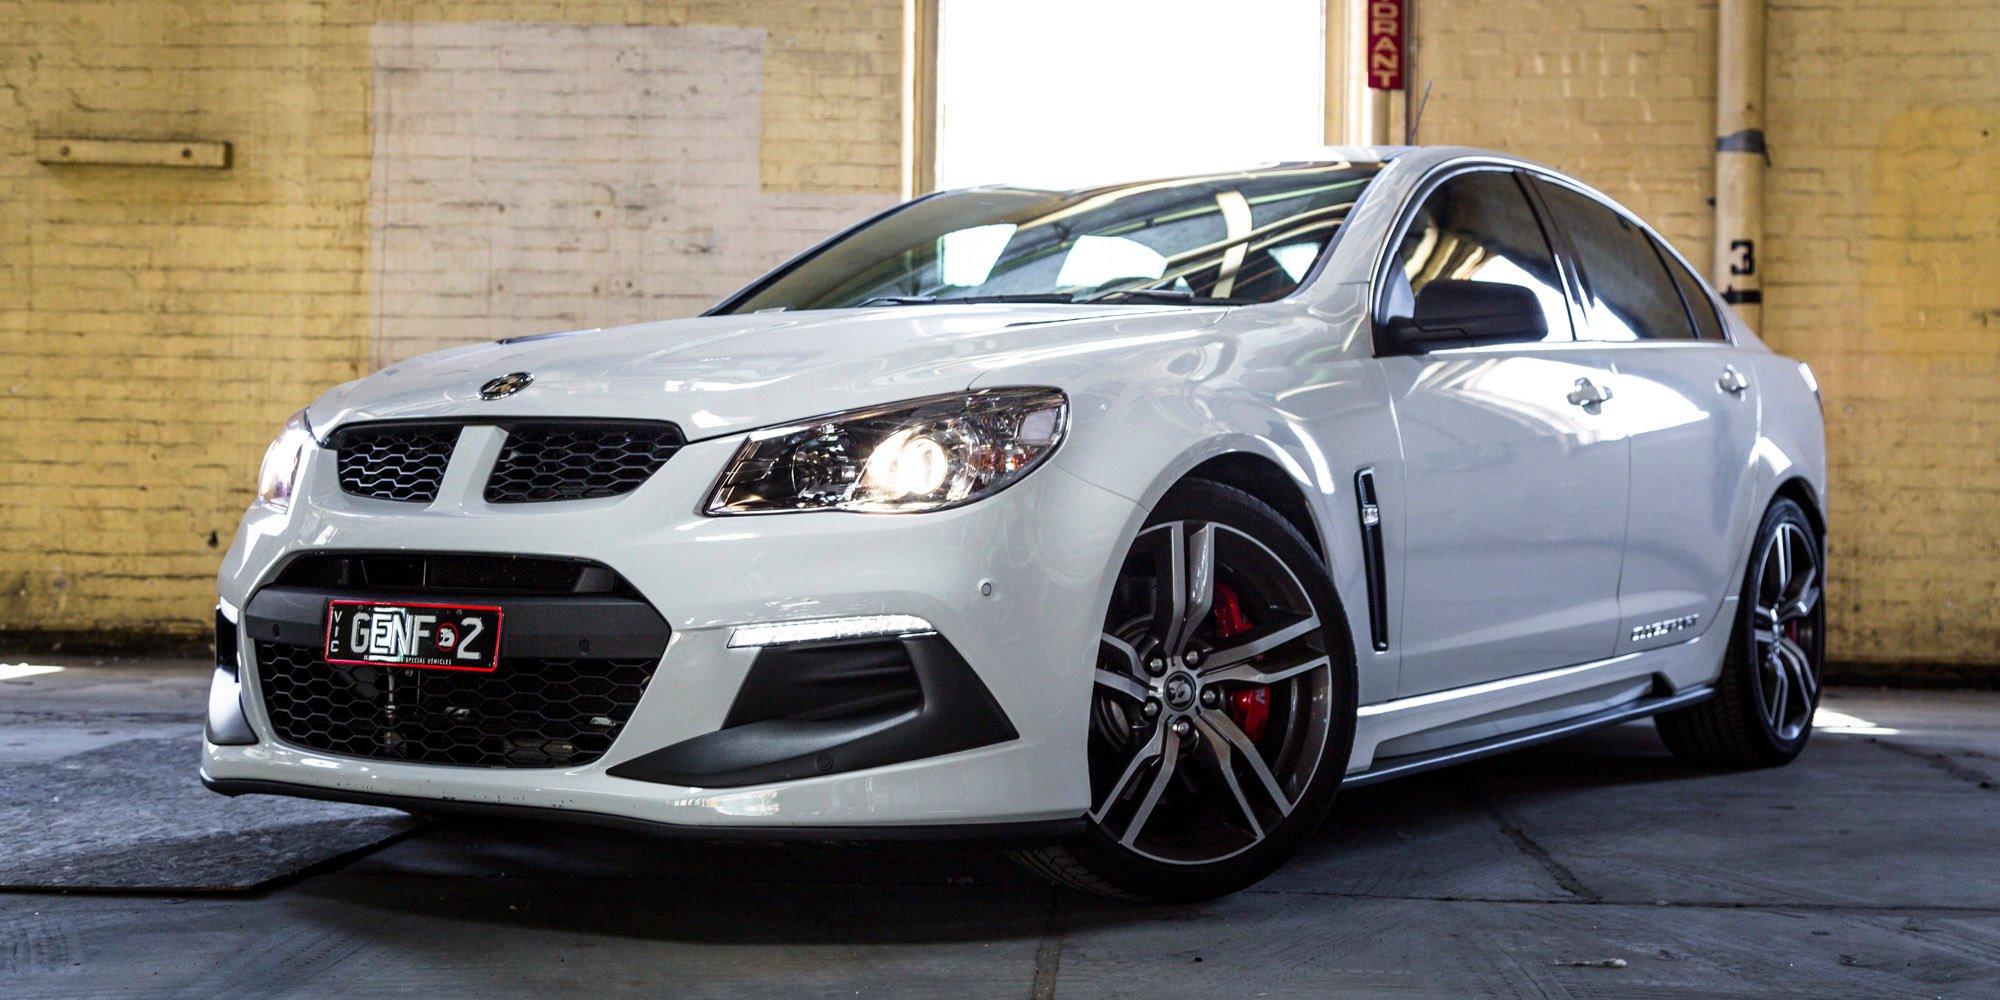 Wonderful Videos 2016 Holden Vfii Commodore Bimodal Exhaust Sound Off 2016